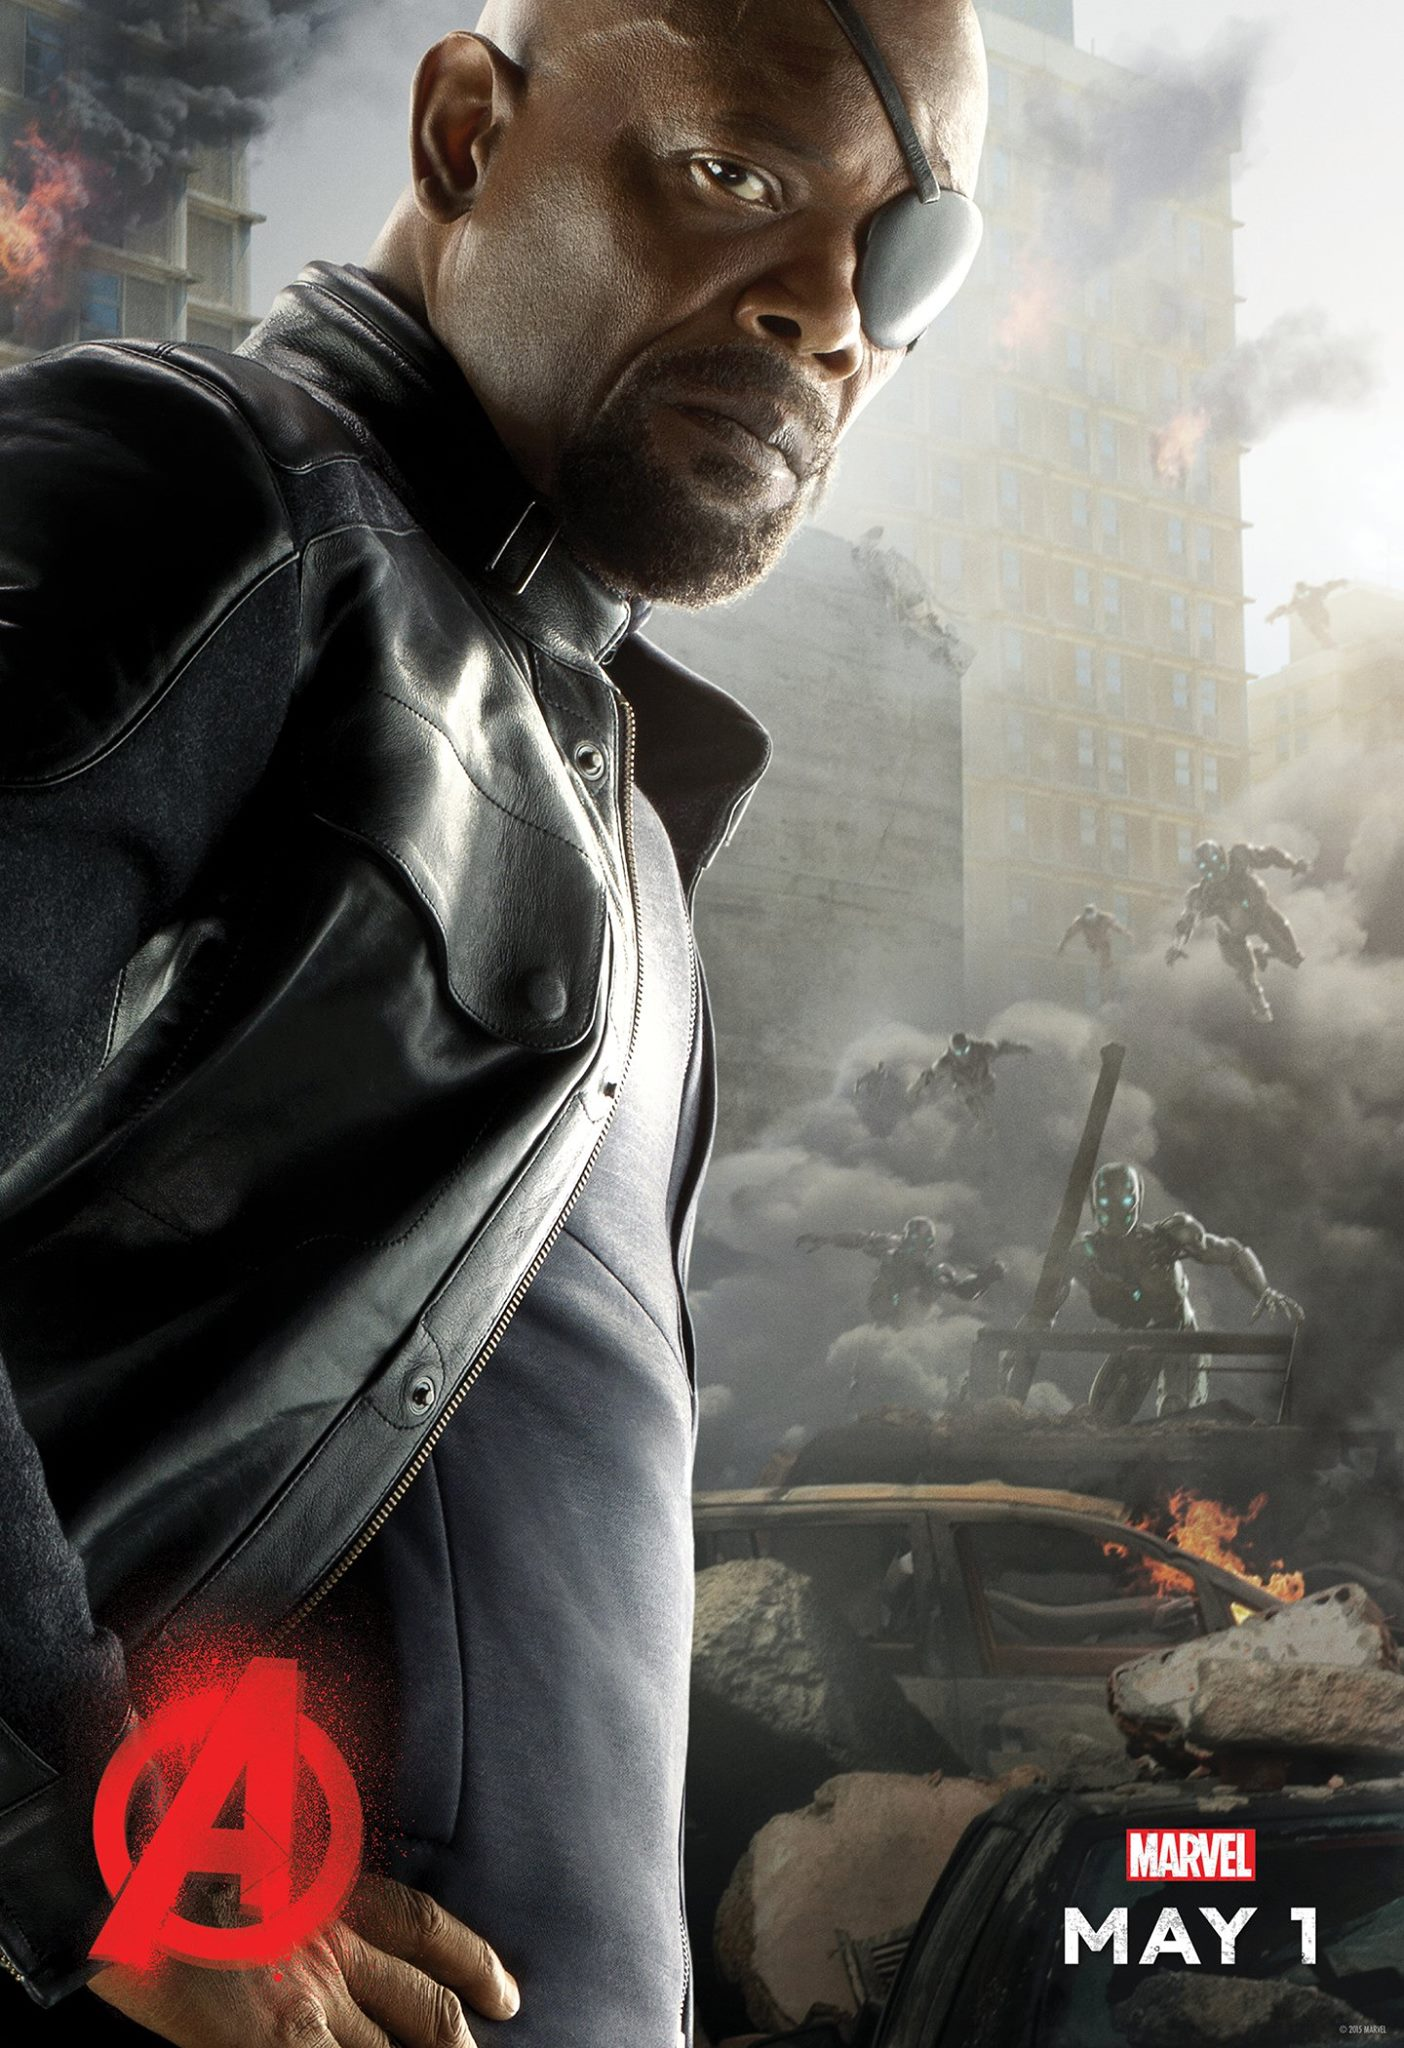 Avengers-Age-of-Ultron-Fury